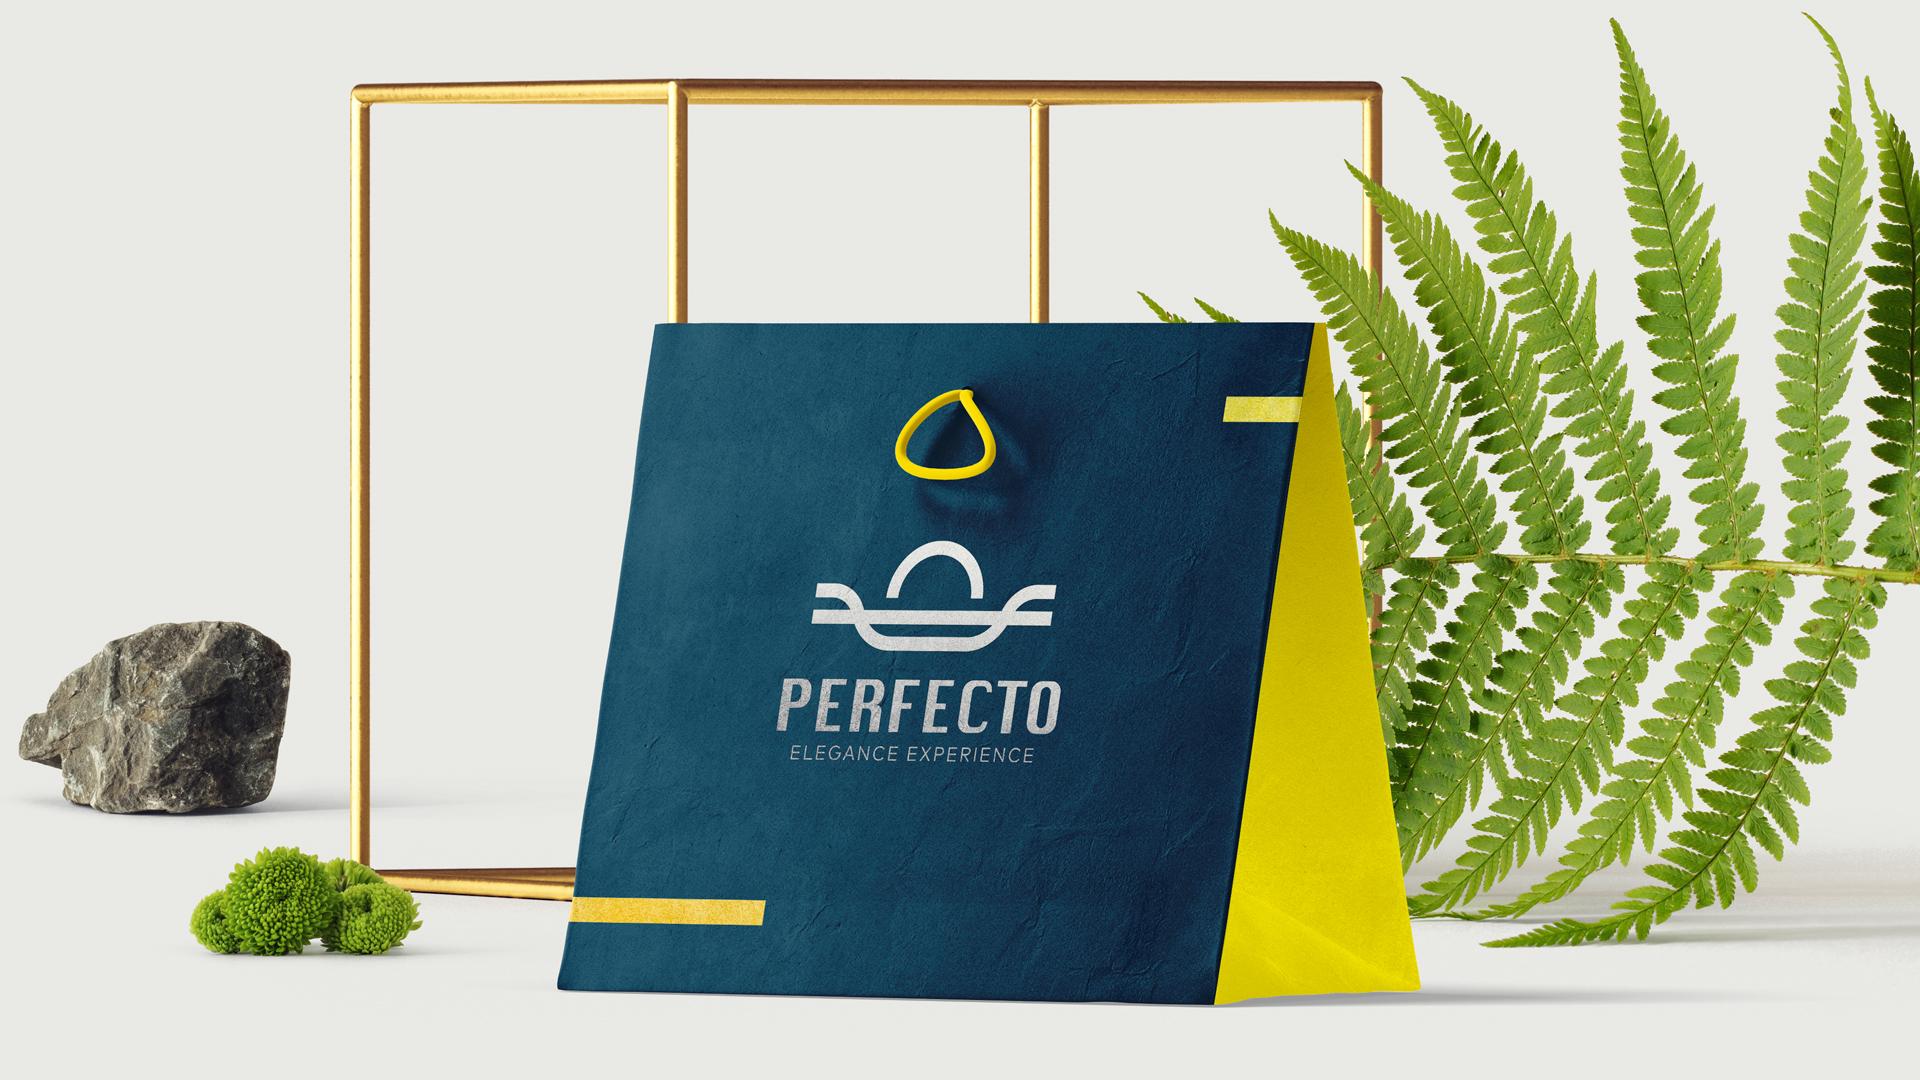 Brandit | Perfecto - ლოგოს დამზადება, ლოგოს დიზაინი, ლოგოების შექმნა, ლოგოების დამზადება, ლოგოს დამზადების ფასი, ბრენდინგი, ბანერების დამზადება, ლოგოტიპის შექმნა, ლოგოტიპების დიზაინი, ოპტიმიზაცია, facebook დიზაინი, ვებგვერდის დიზაინი, ლოგოების დიზაინი, ლოგოტიპების დამზადება, saitebis damzadena, logoebis damzadeba, saitis damzadeba, logos damzadeba,